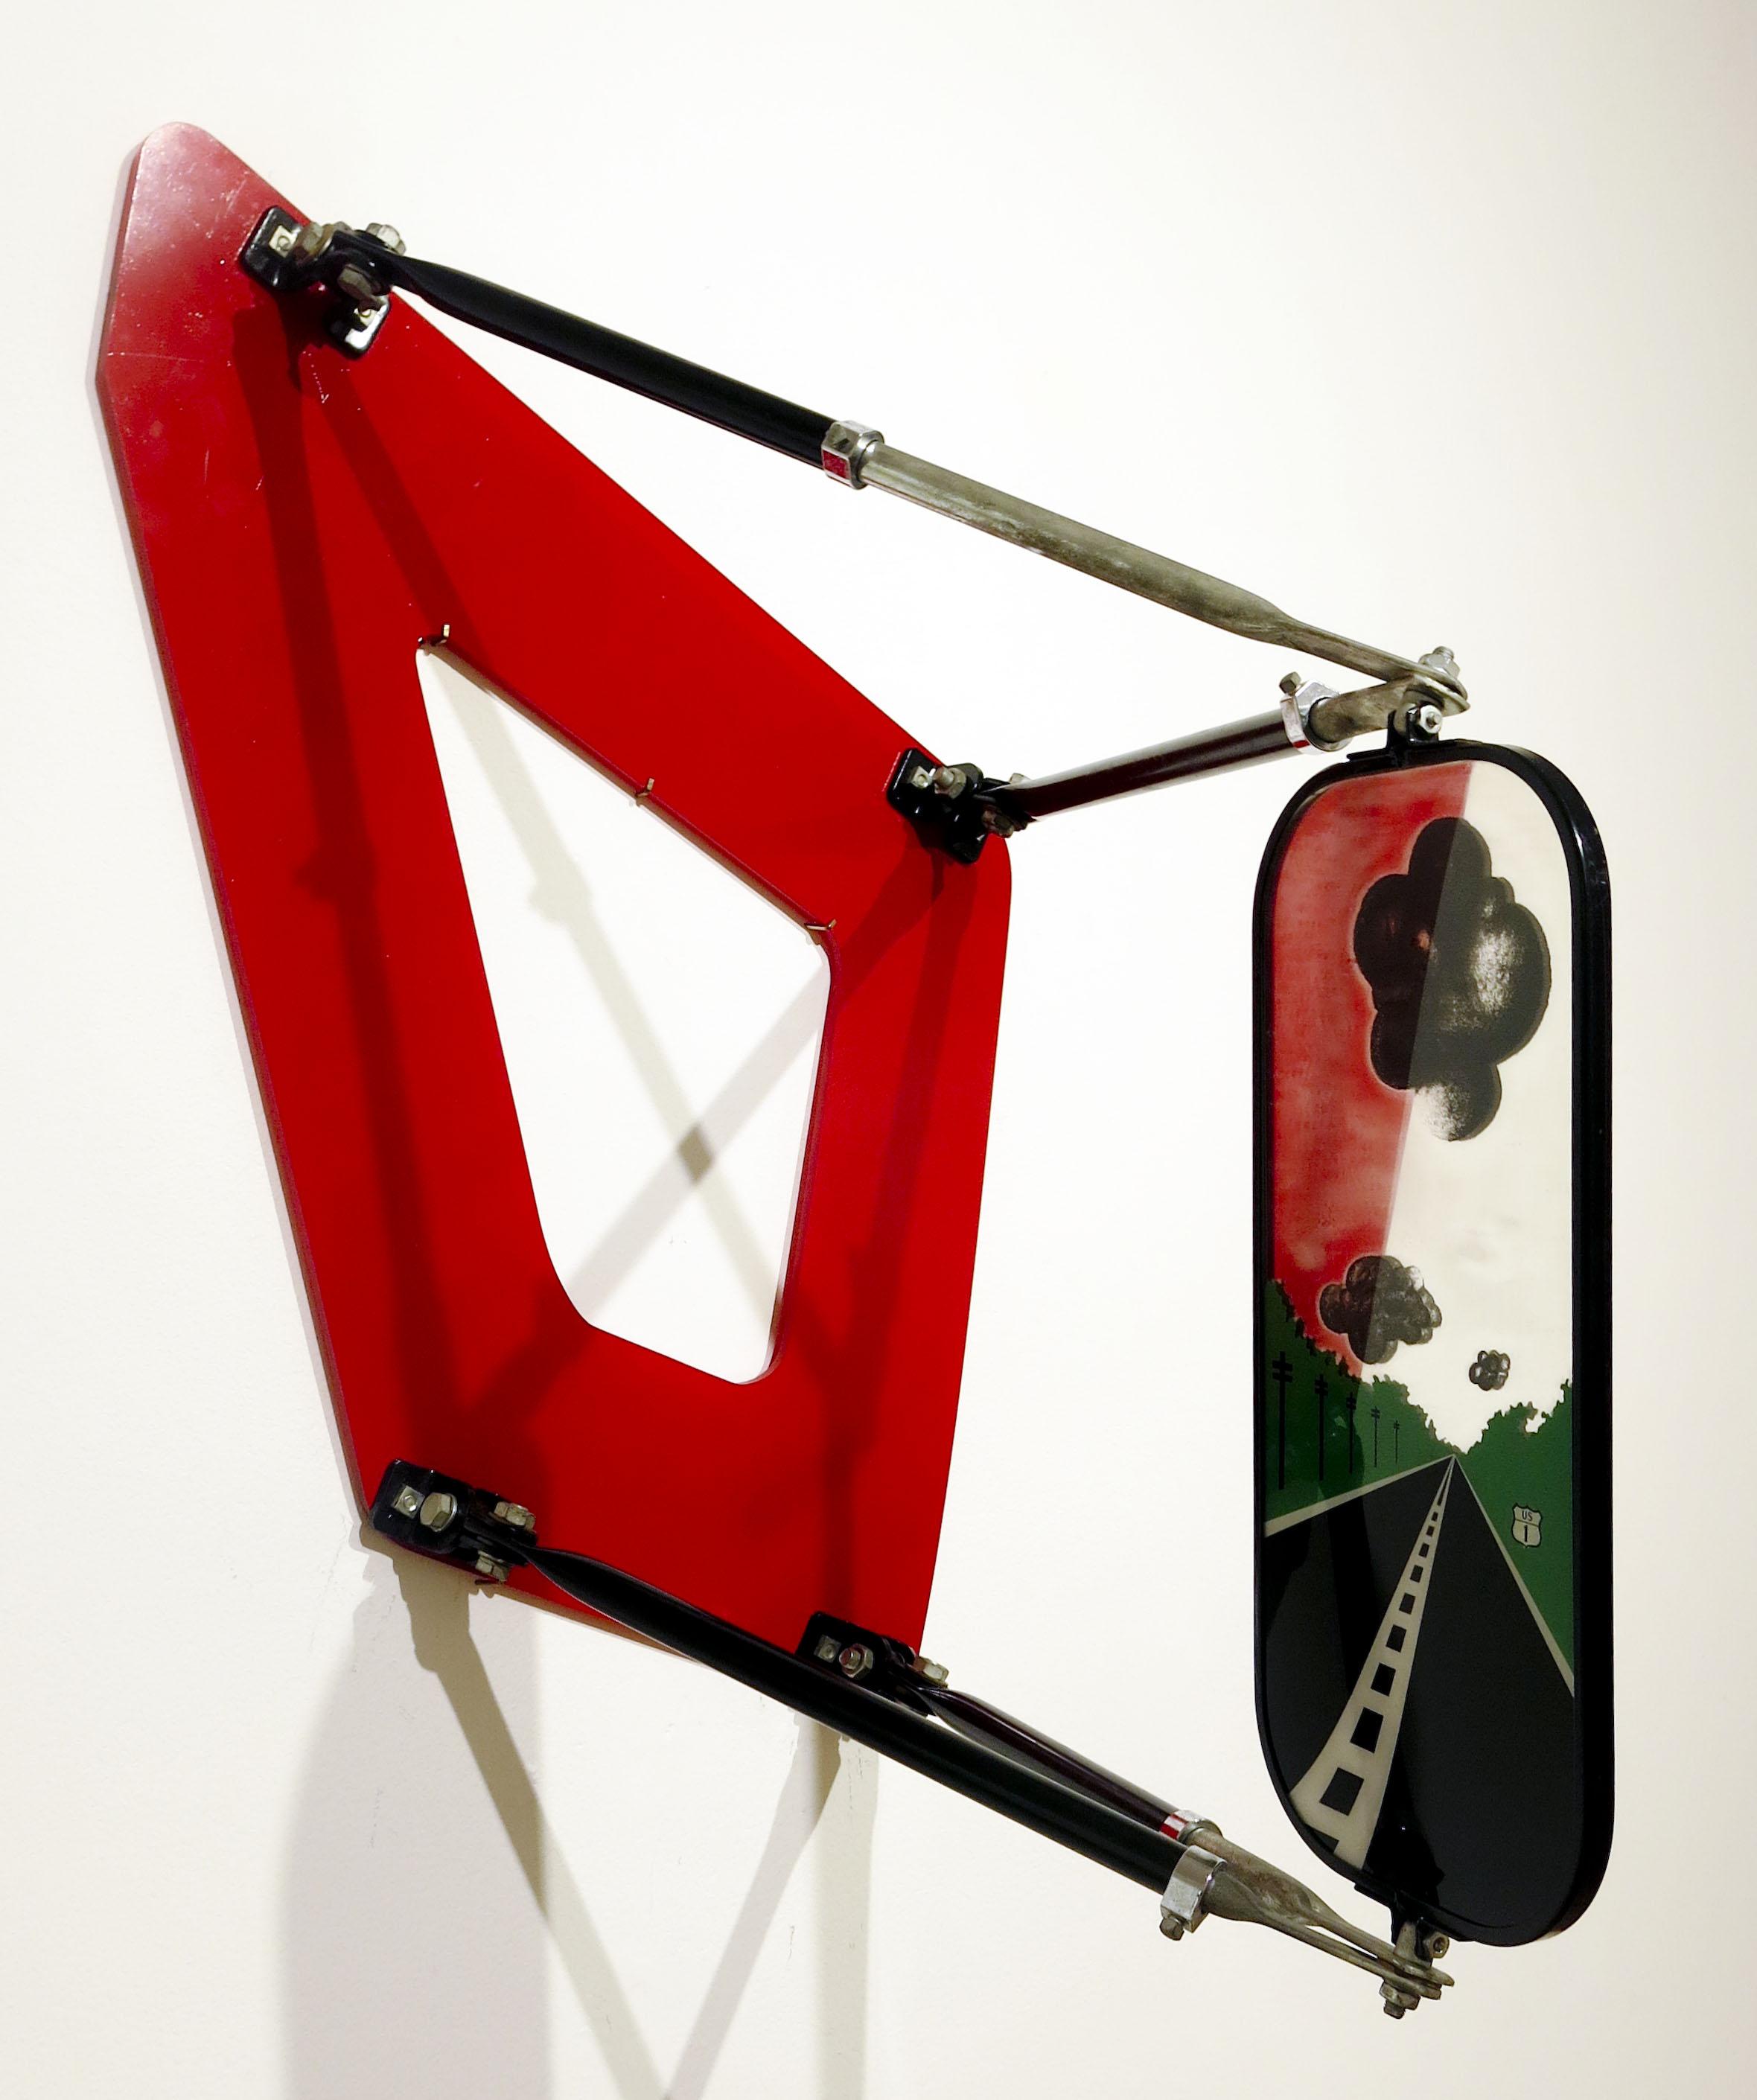 Allan D'Arcangelo,  Landscape Bus Mirror , 1970, Mixed media, 18 1/2h x 22w x 13 3/4d in. Ed. 2 of 100